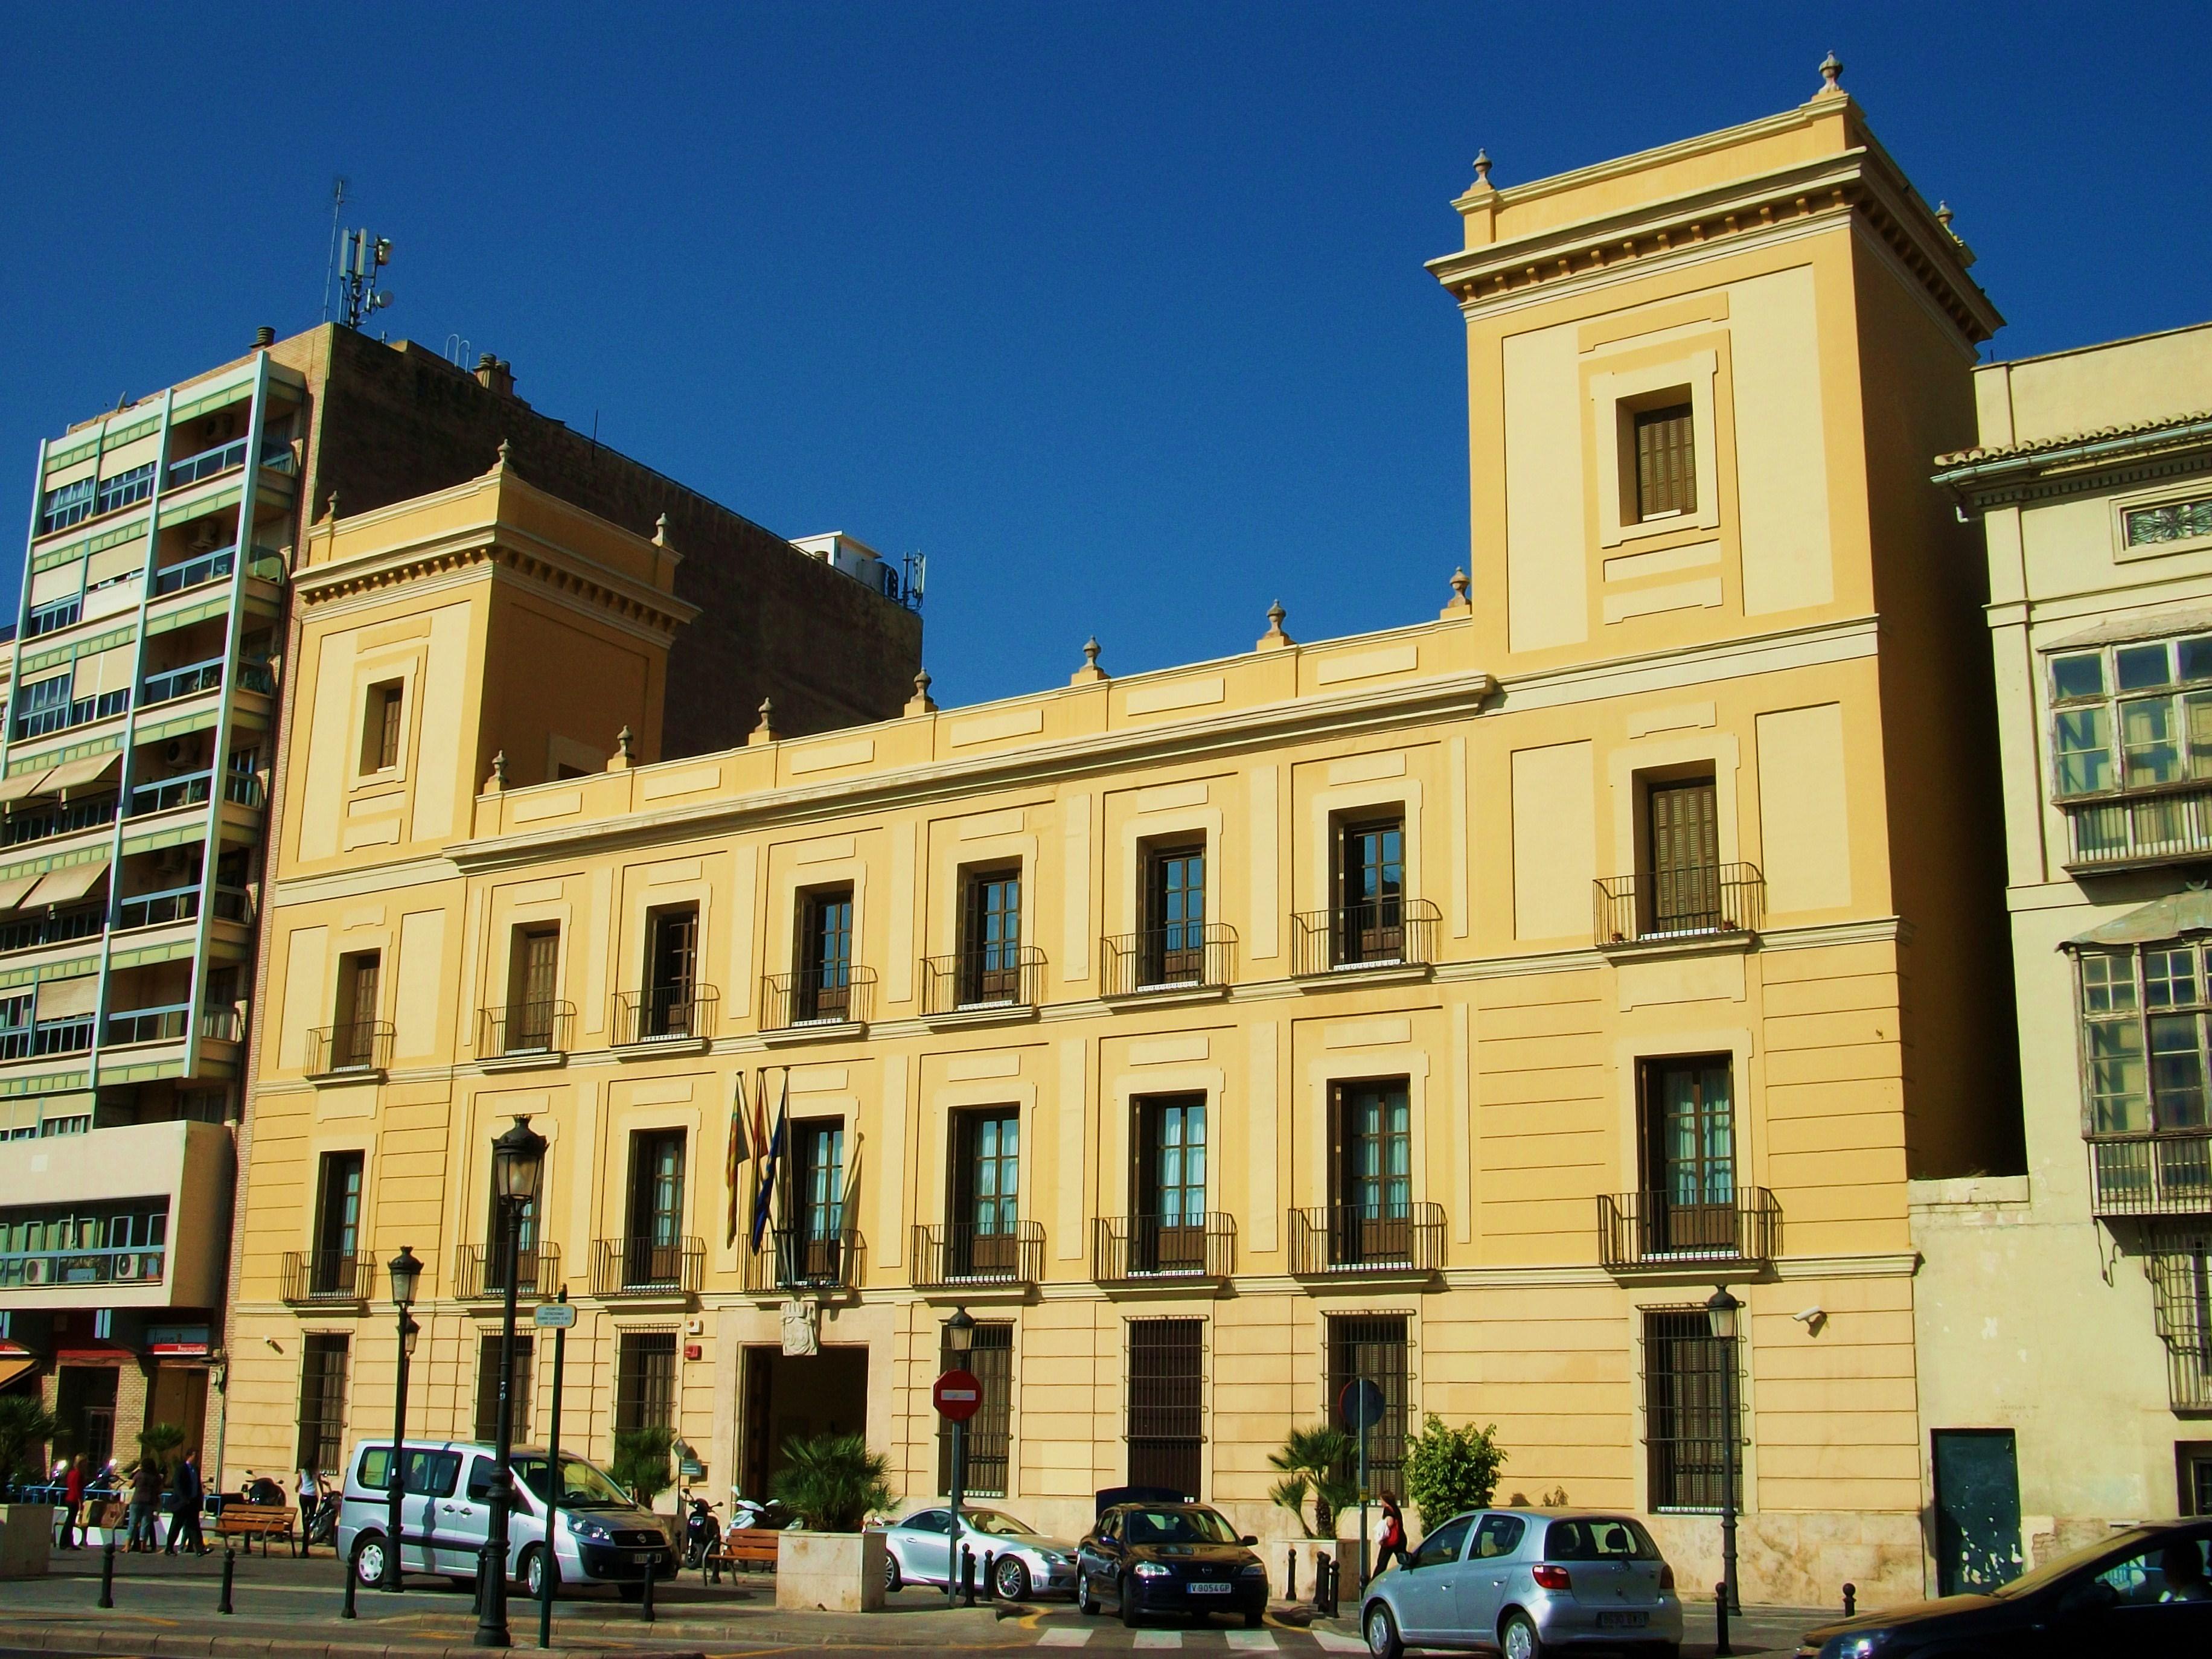 Resultado de imagen de palau de Cervelló, Valencia